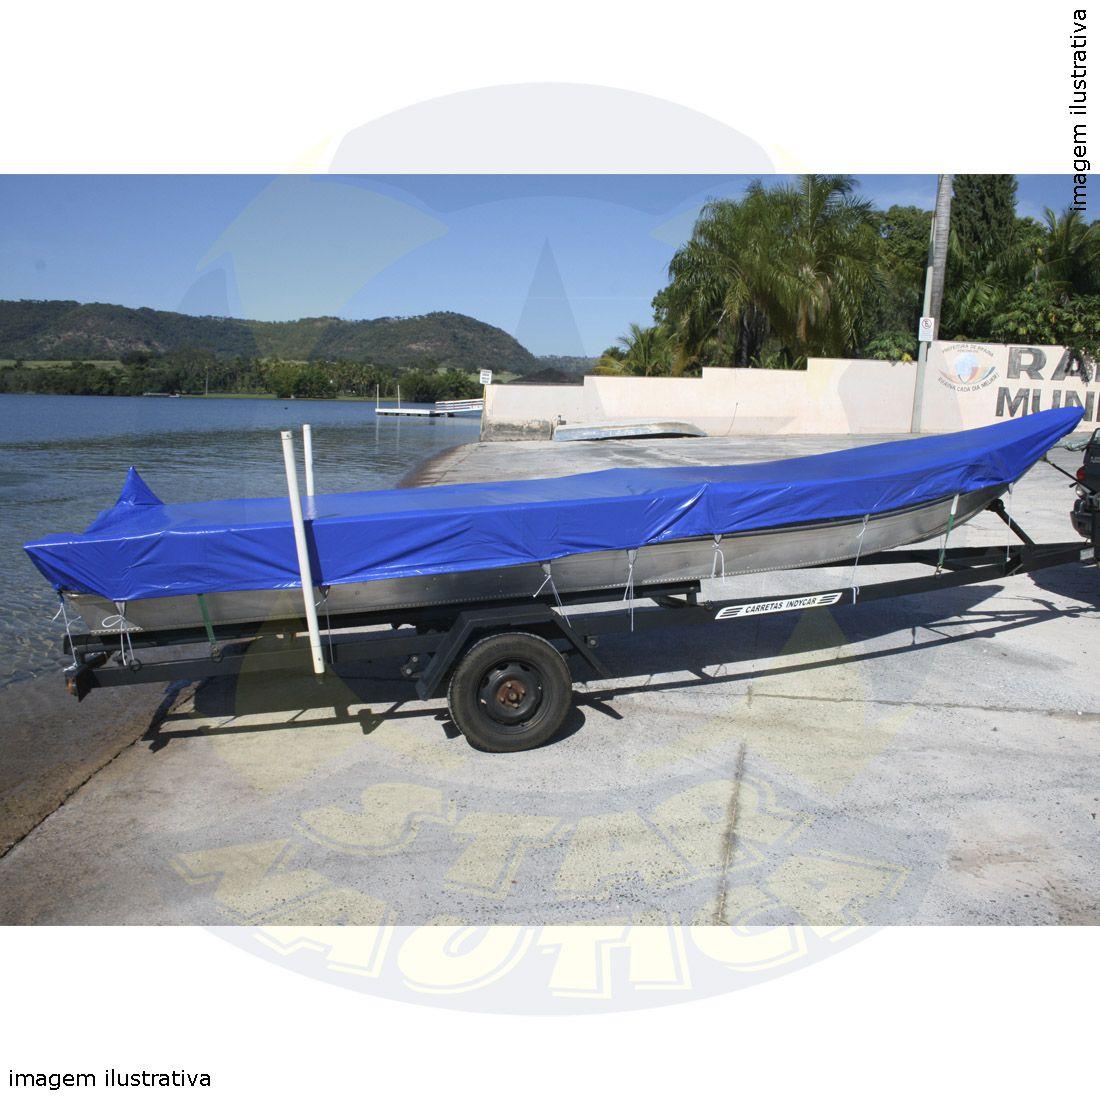 Capa Lona de Cobertura Barco Karib 600 Lona Poliéster